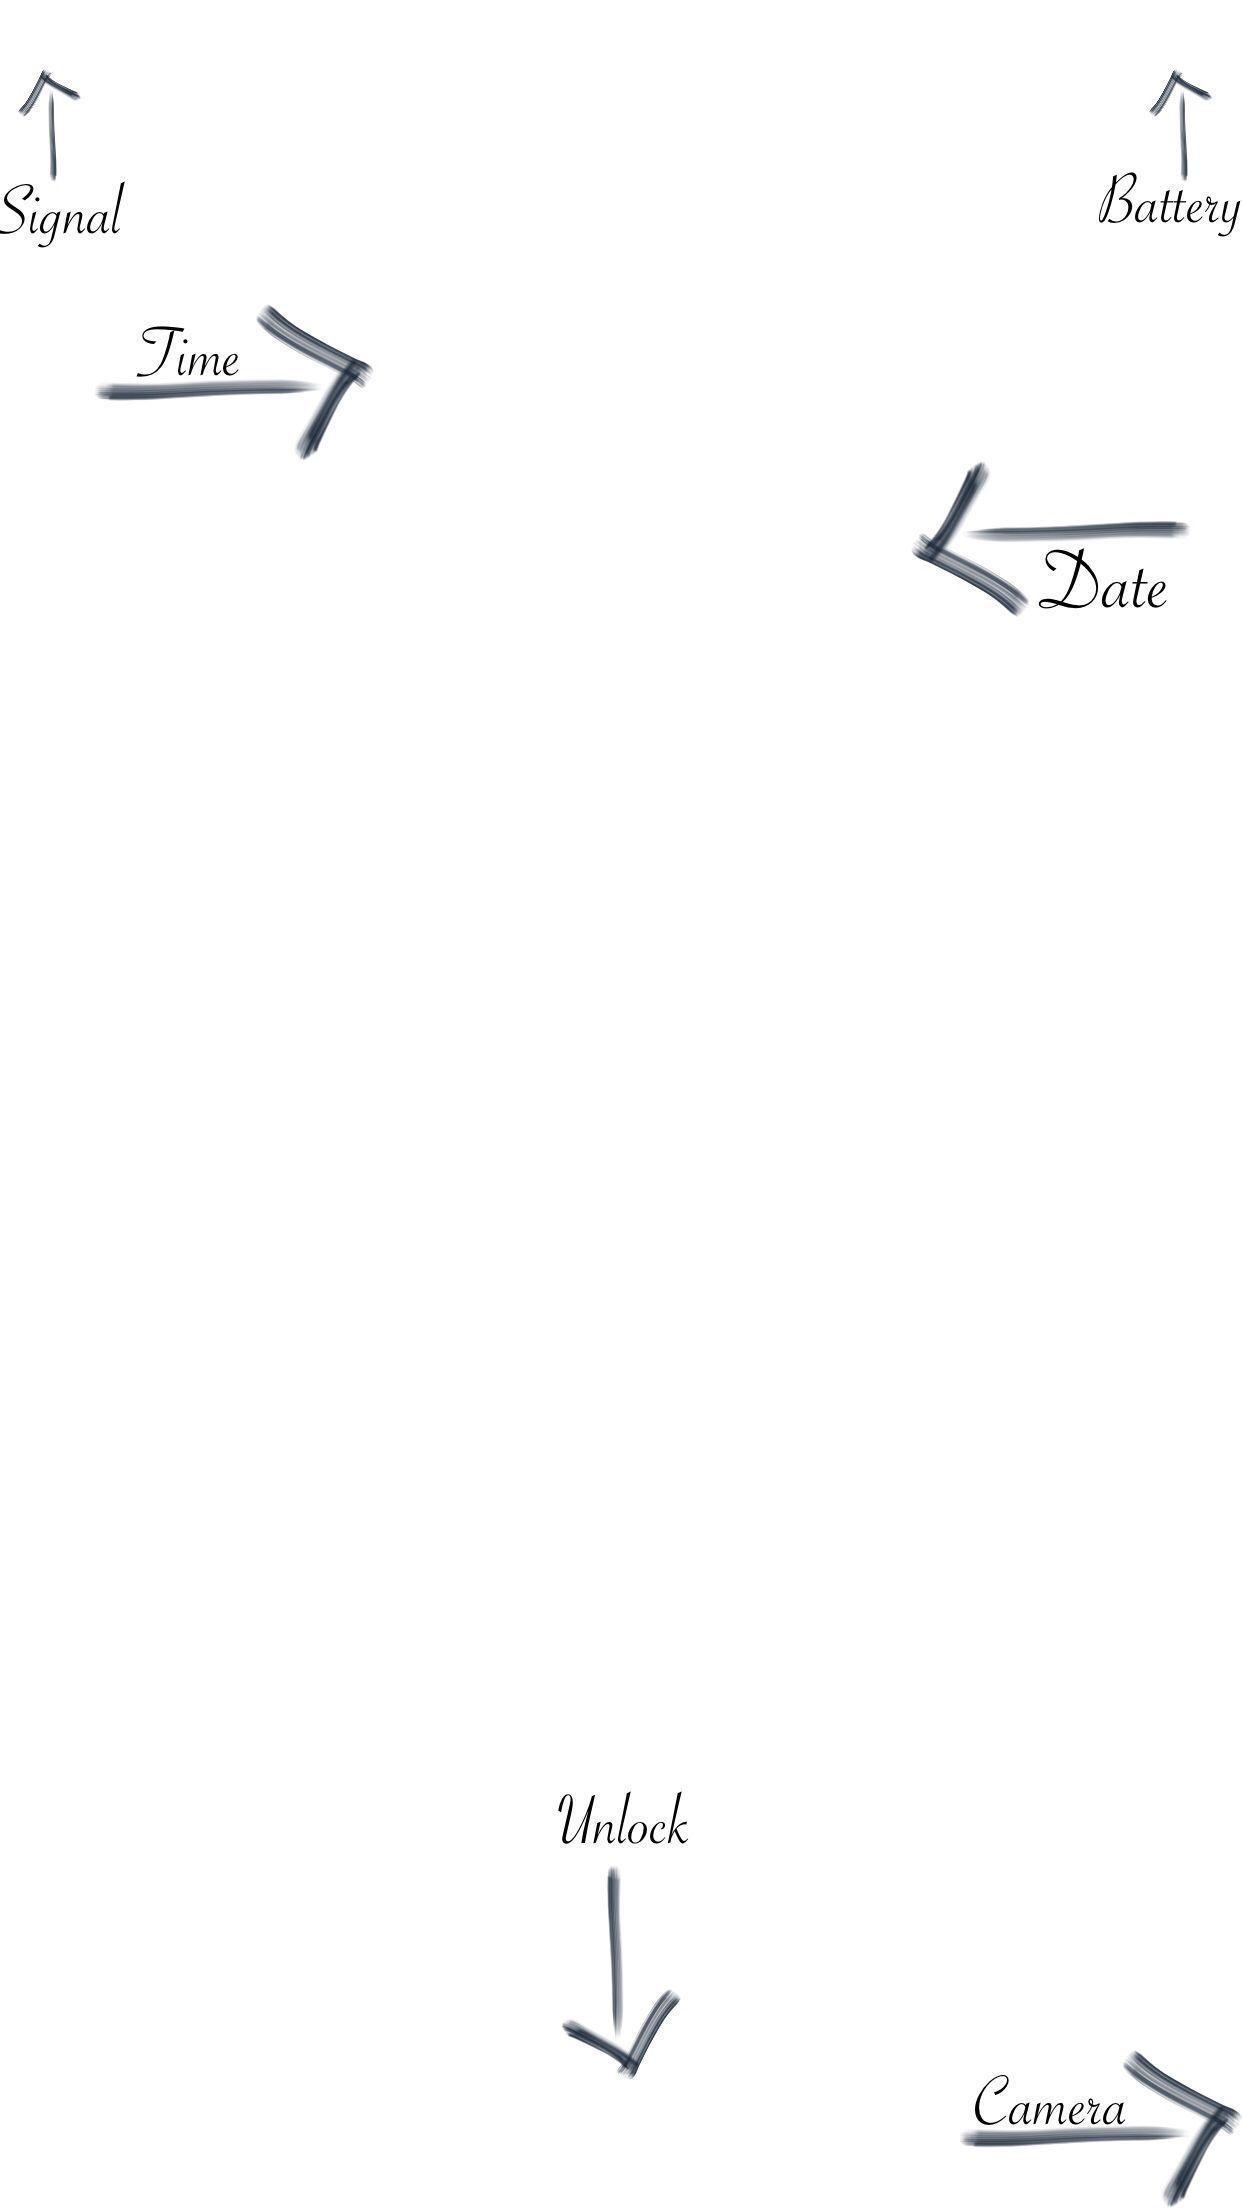 21 Most Creative Smartphone Wallpaper Make Feel Your Iphone Unique 27 Iphonewallpaper Tumblr Iphone Wallpaper Funny Lock Screen Wallpaper Smartphone Wallpaper